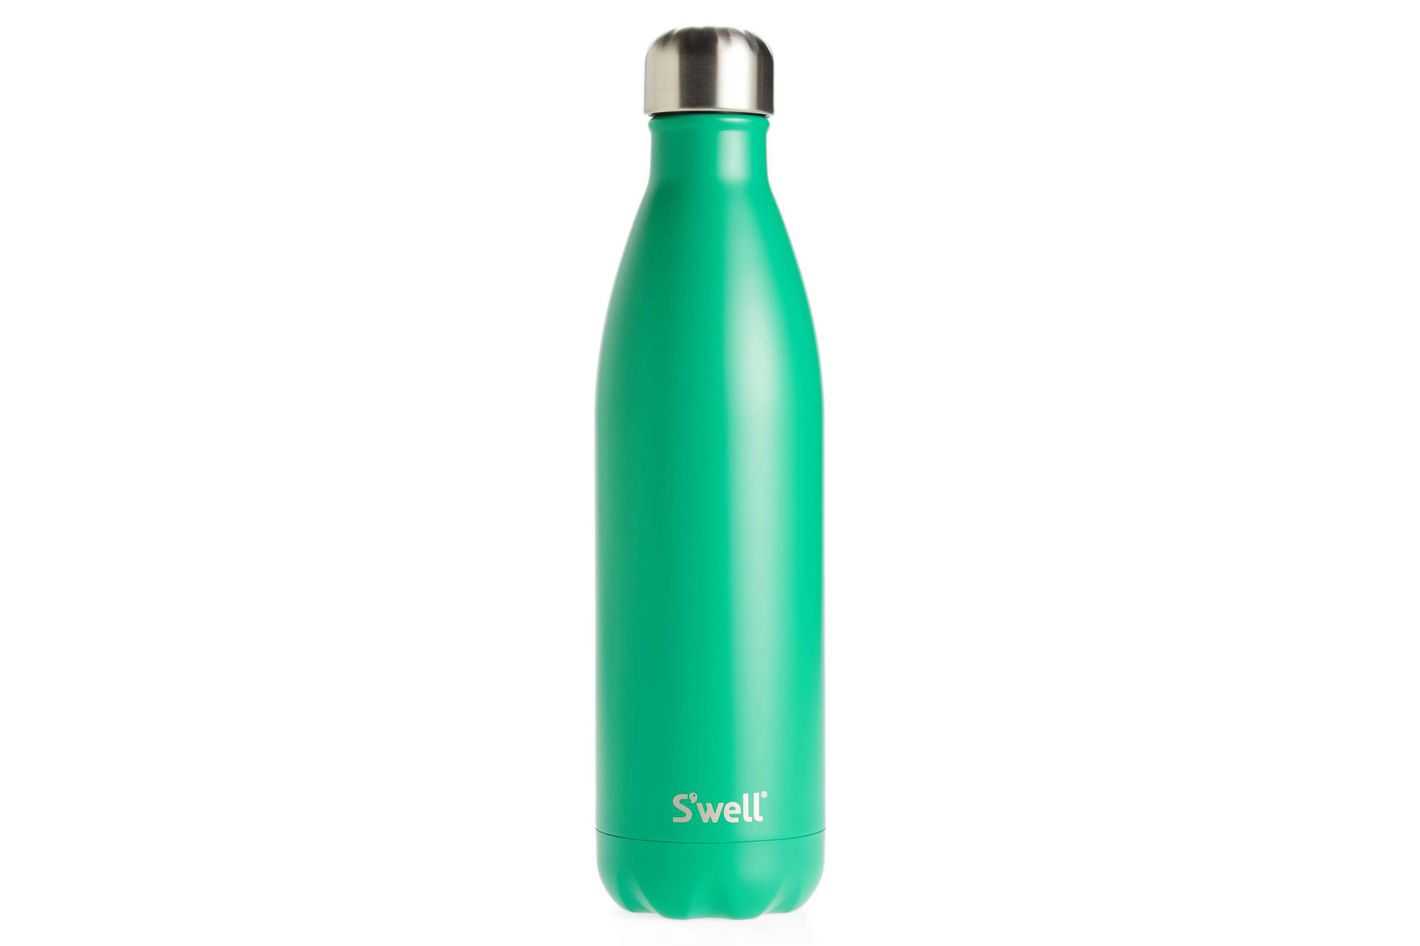 S'well Eucalyptus Insulate Stainless Steel Water Bottle